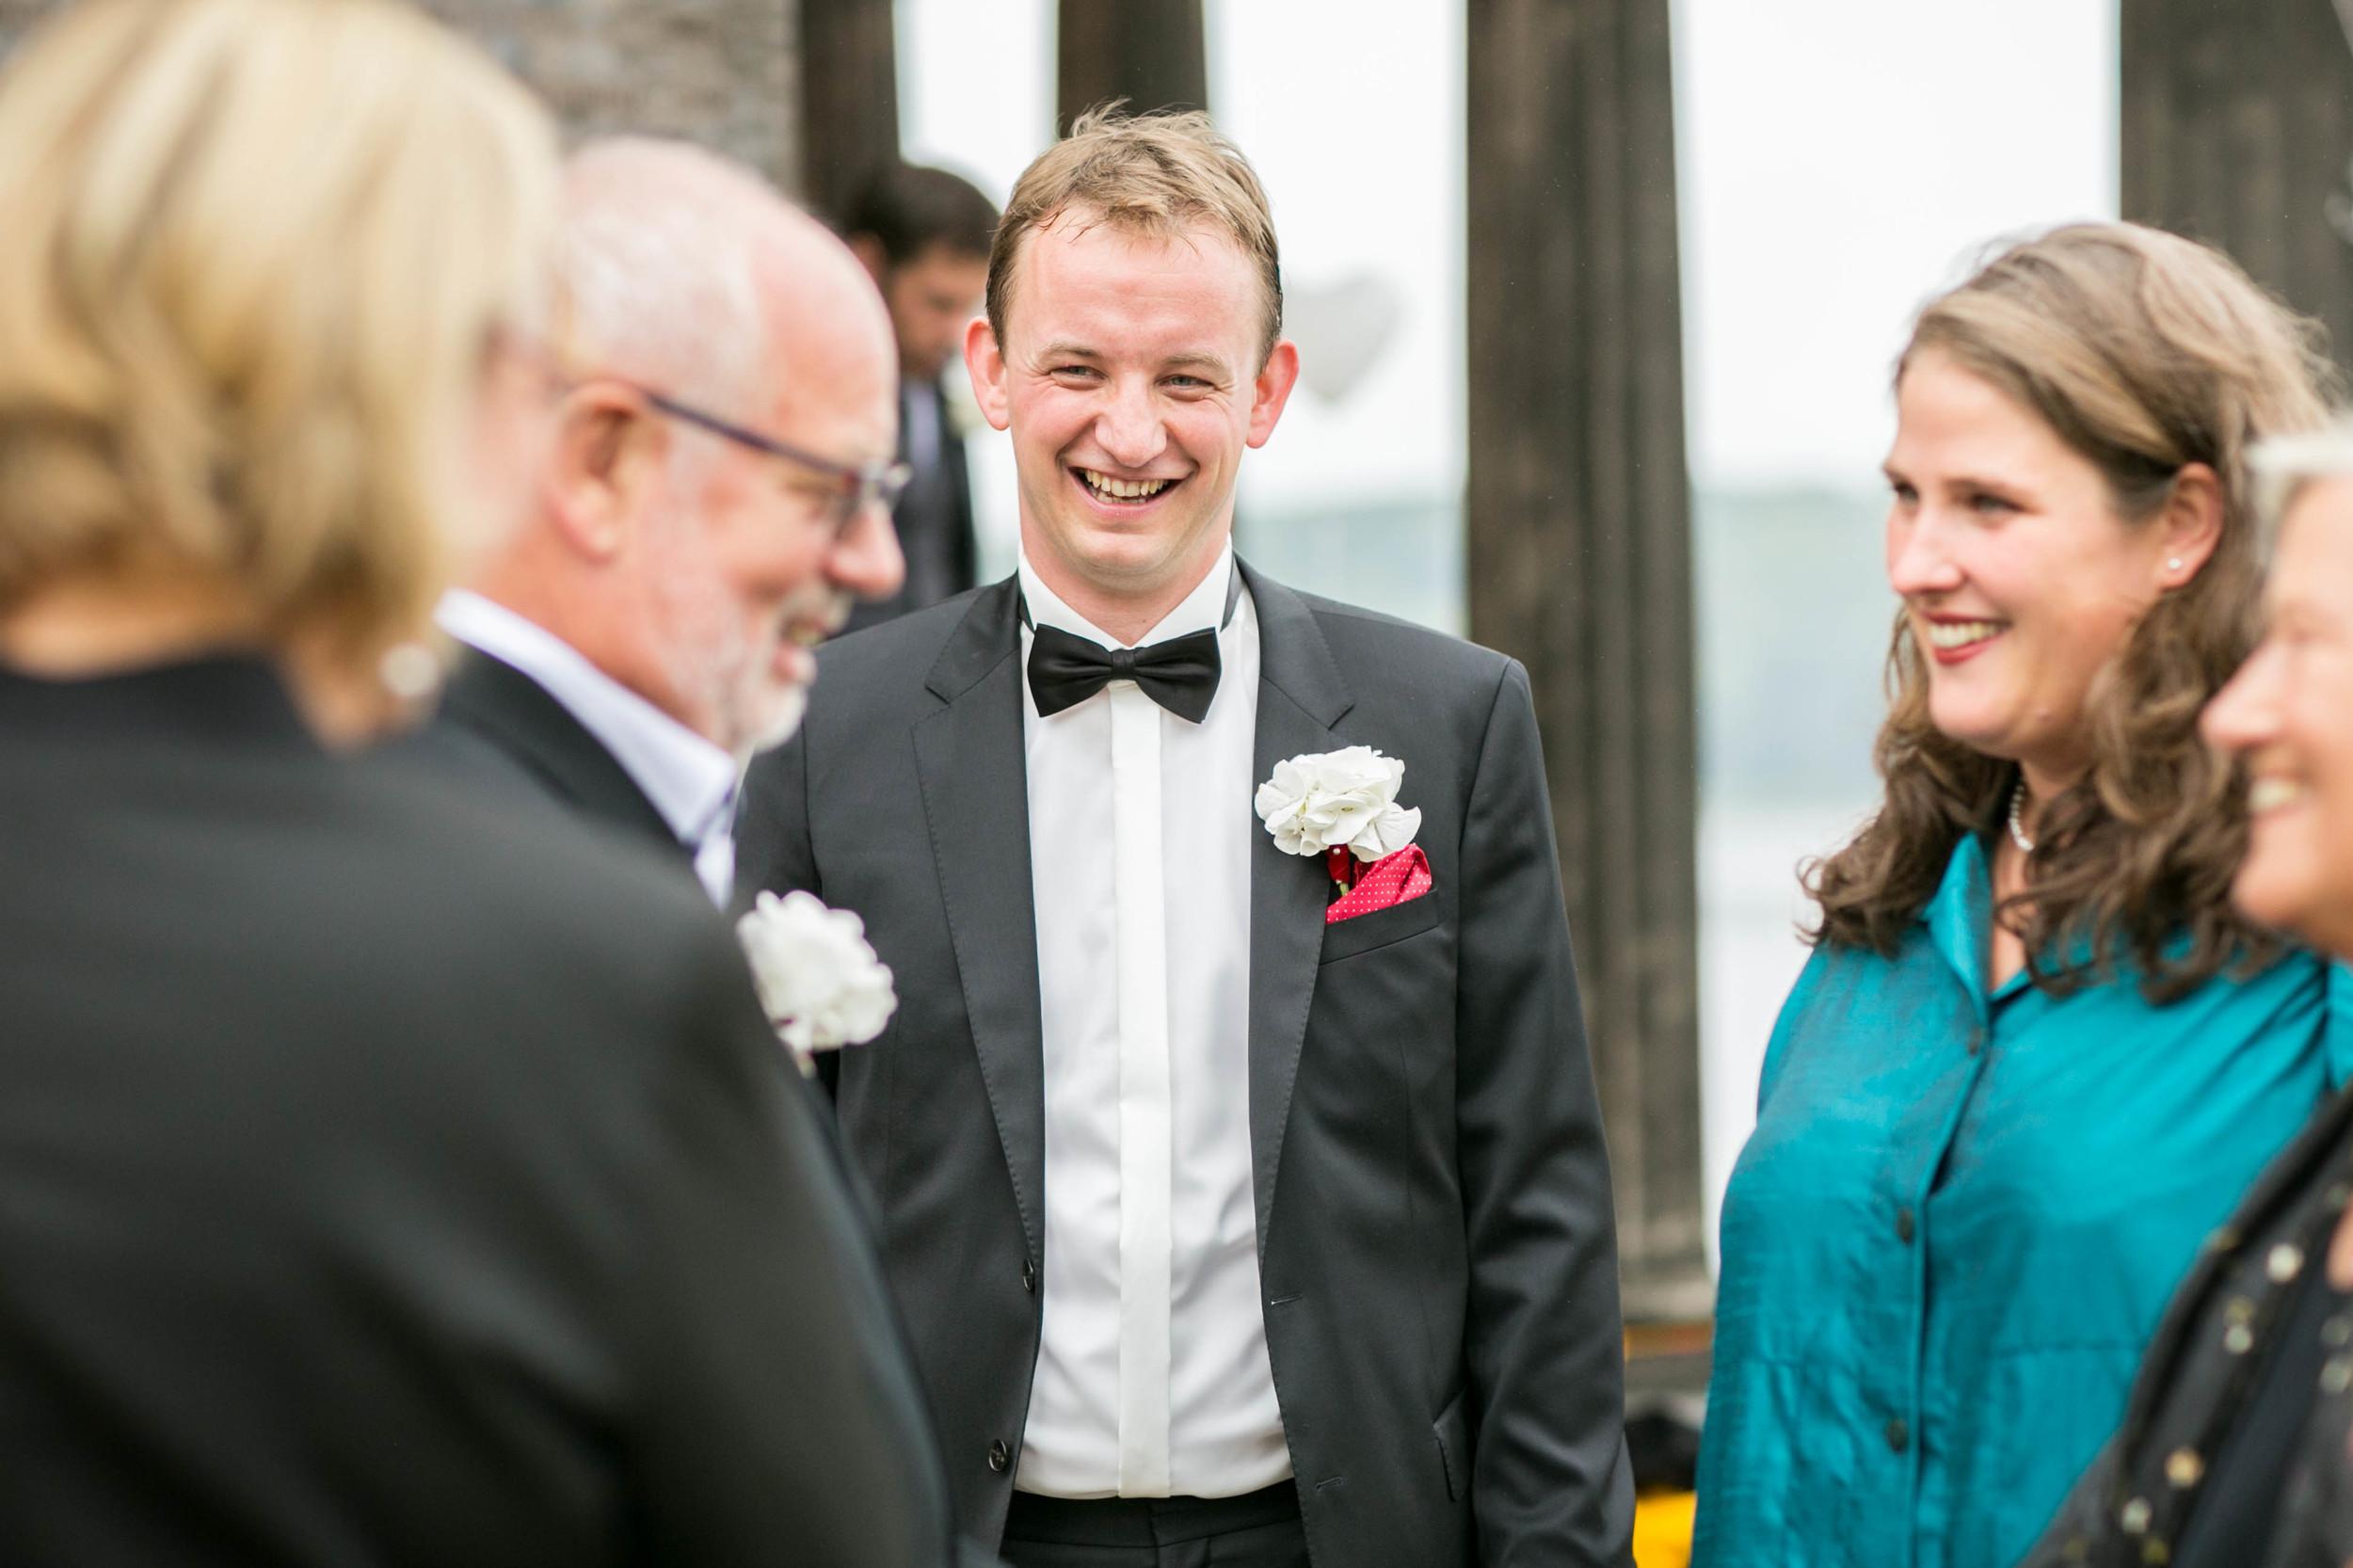 Michelberger Hotel Berlin Hochzeitsfotografie_Fran Burrows Fotografie-8.jpg